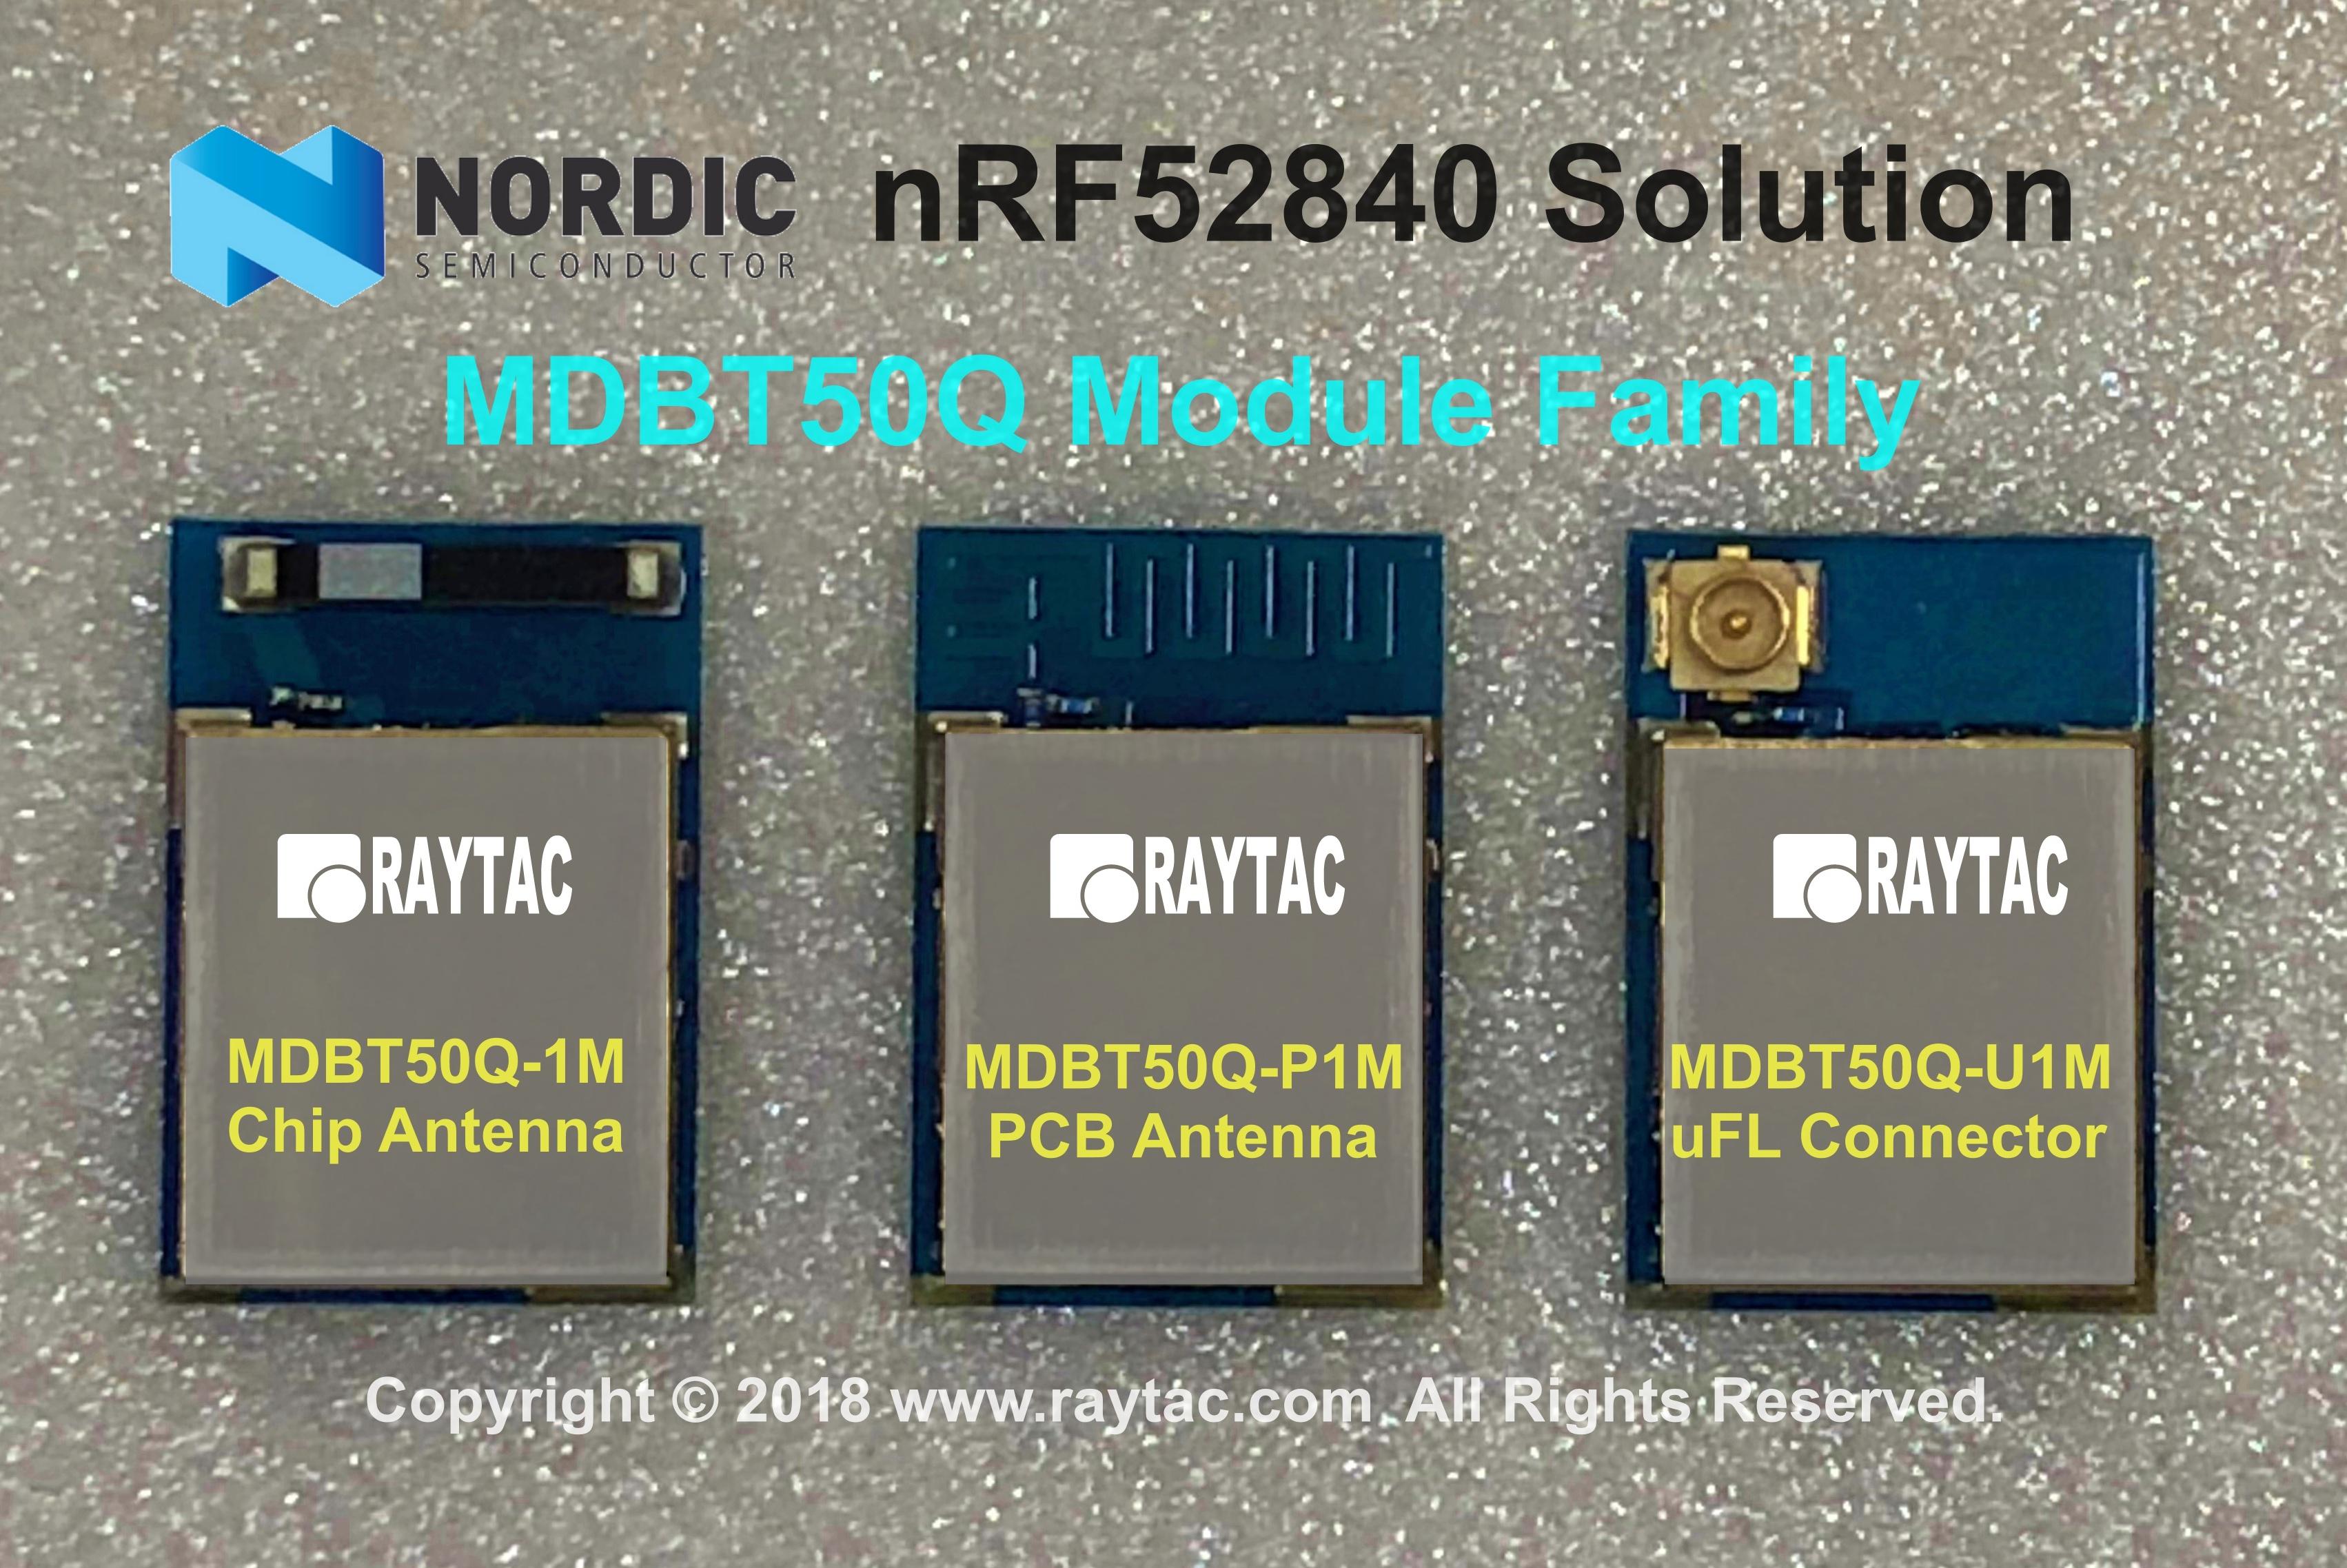 Raytac CorporationBT5/BT4 2/BT4 1/BT4 0 Module MakerRaytac